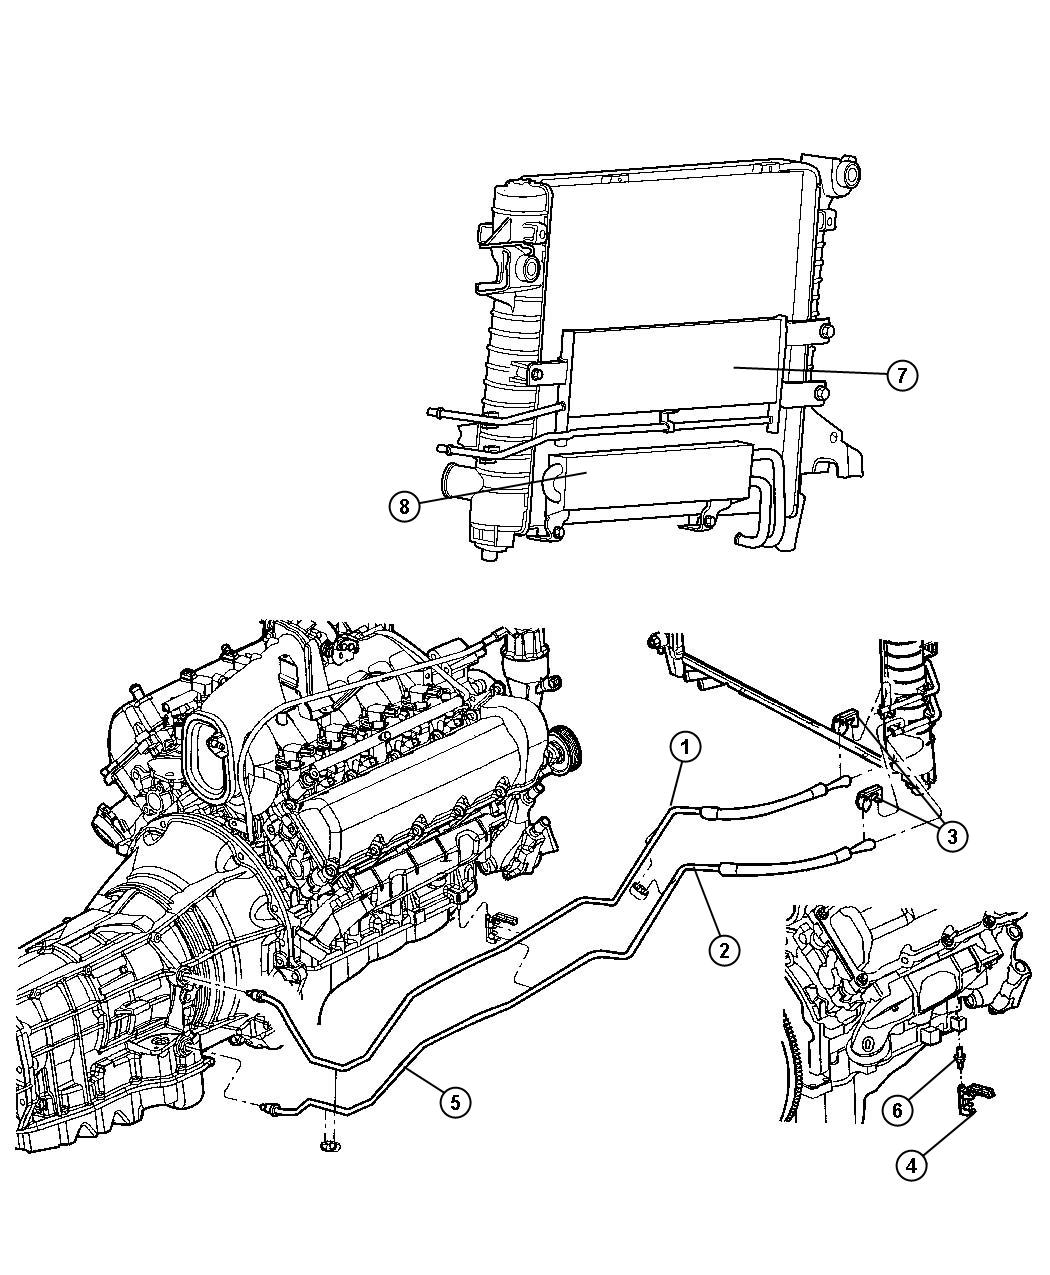 hight resolution of dodge 3 7 engine diagram